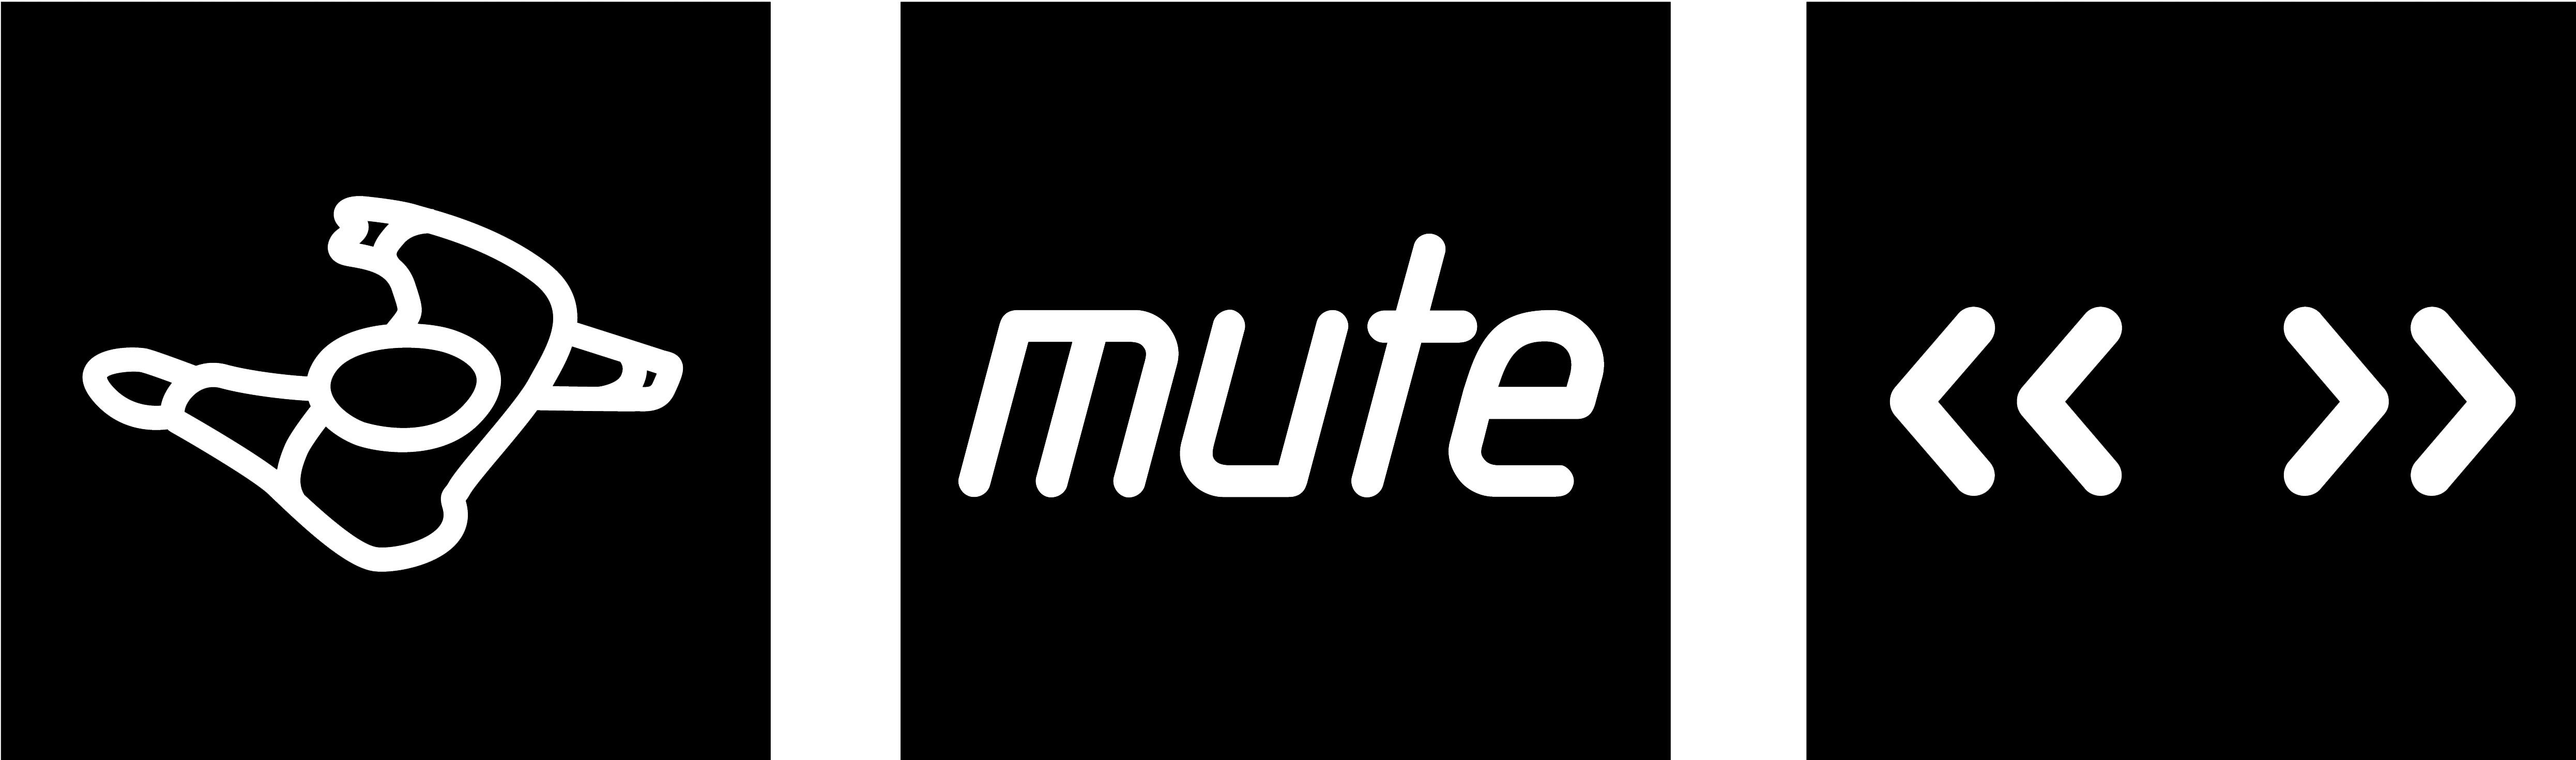 Mute main logo black